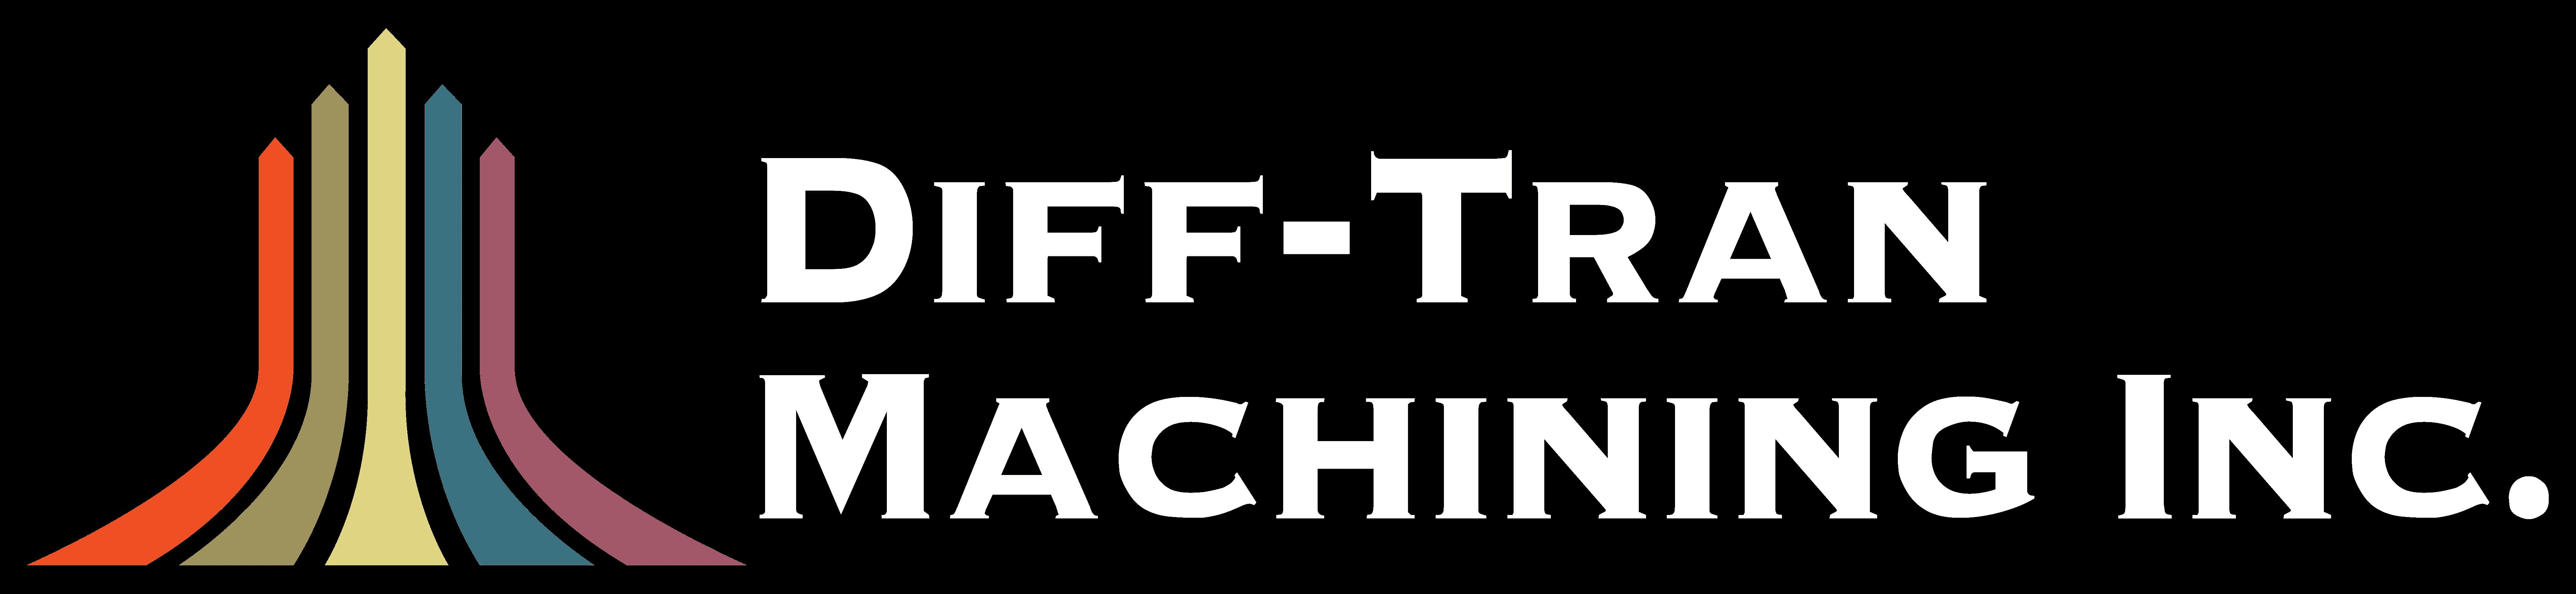 Diff-Tran Machining